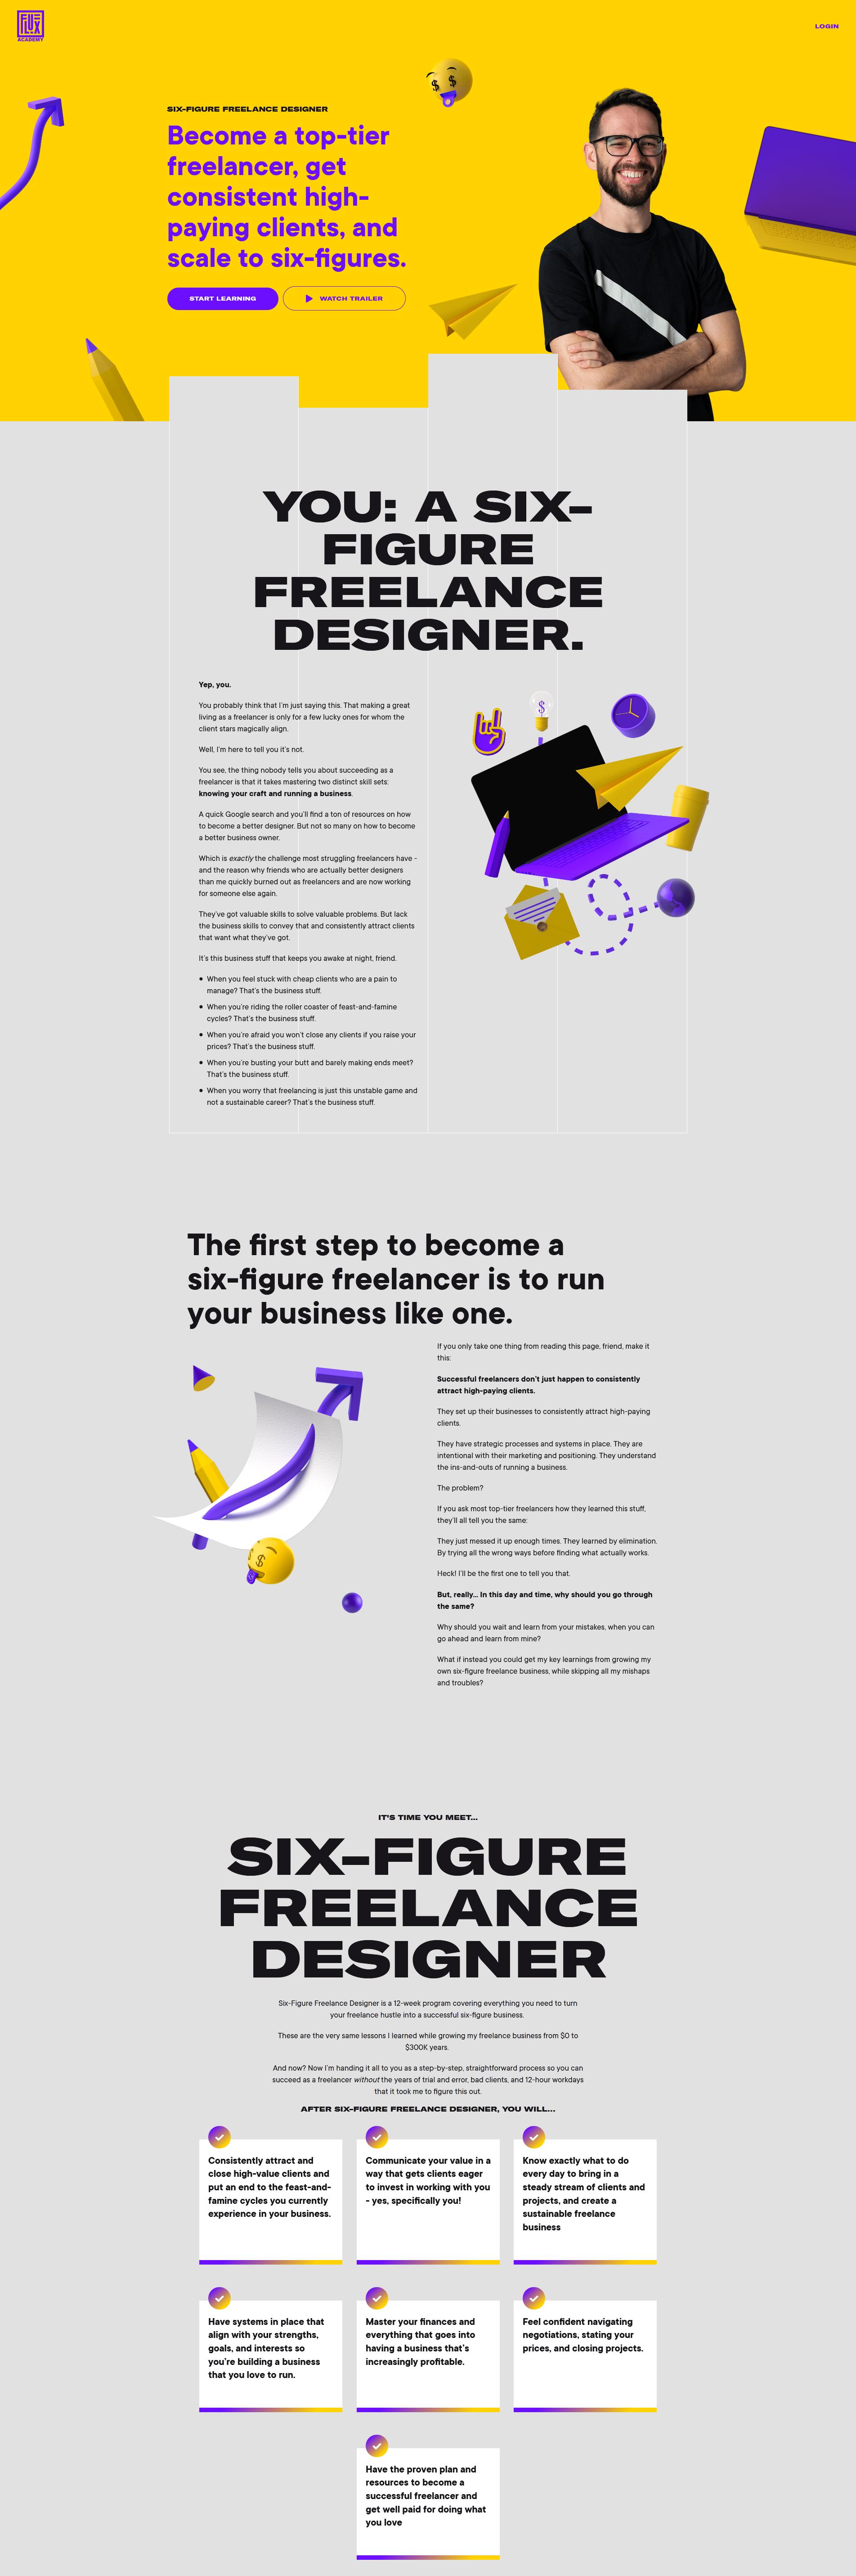 Flux Academy - The 6 Figure Freelance Designer